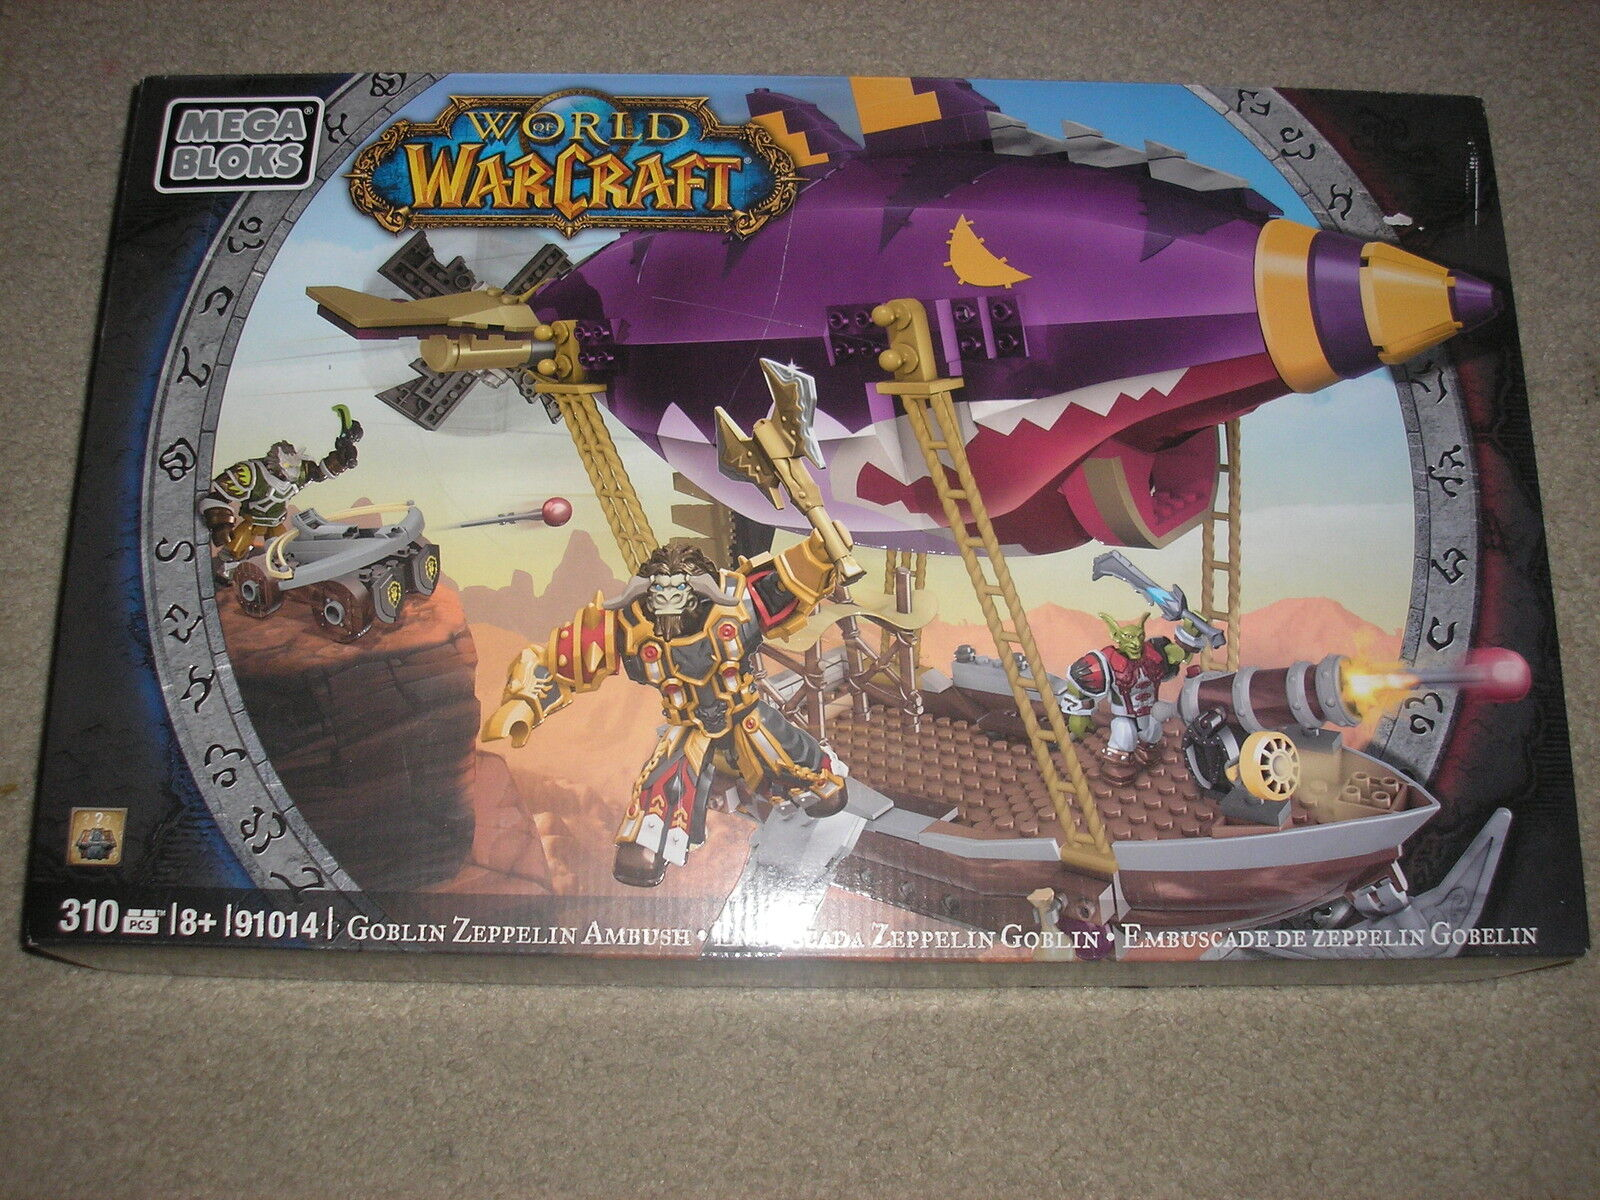 New Mega Bloks World of WarCraft Goblin Zeppelin Ambush 91014 310 pieces